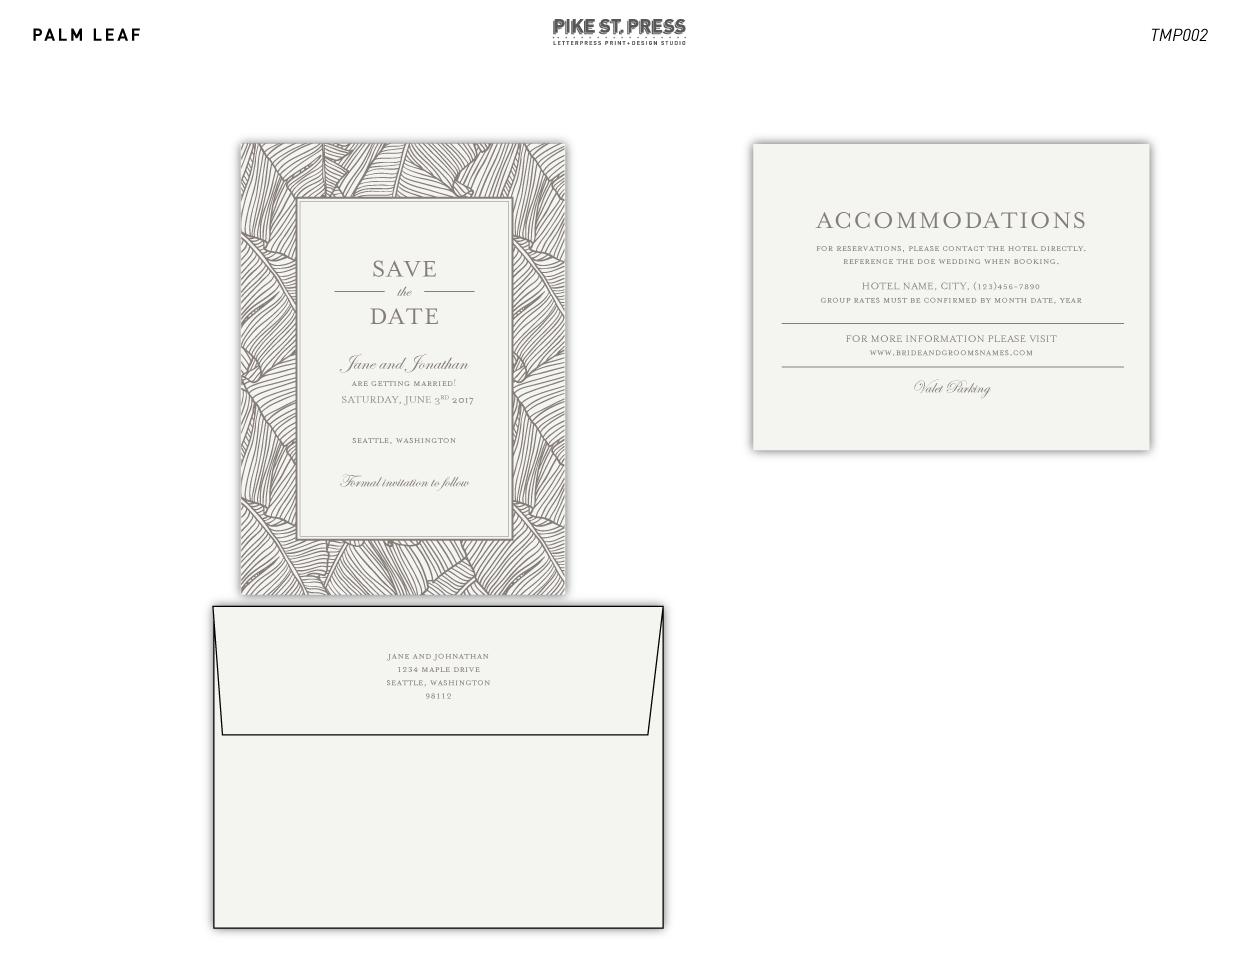 Palm Leaf TMP002 – Wedding Invitation – Pike Street Press